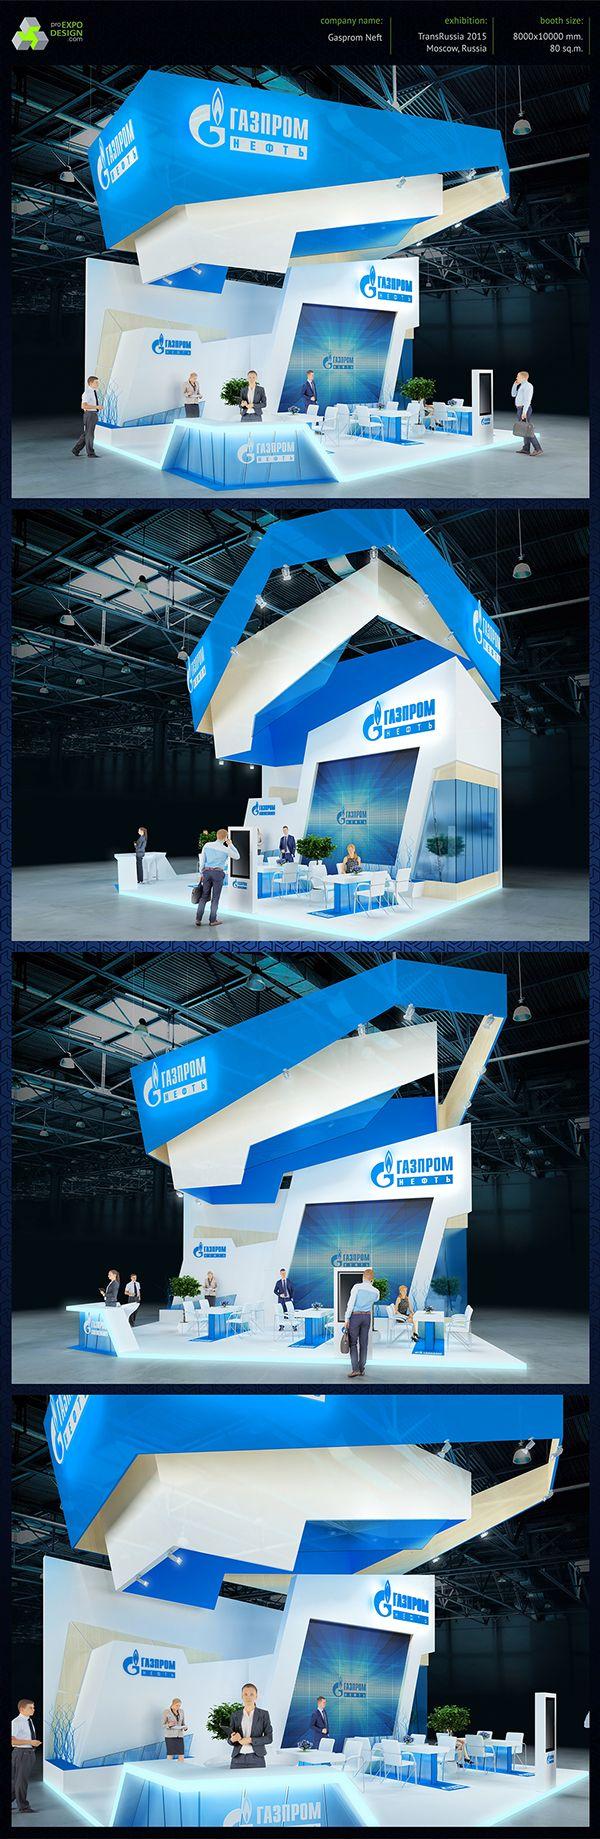 Exhibition Booth Behance : Gazprom on behance exhibition booth pinterest